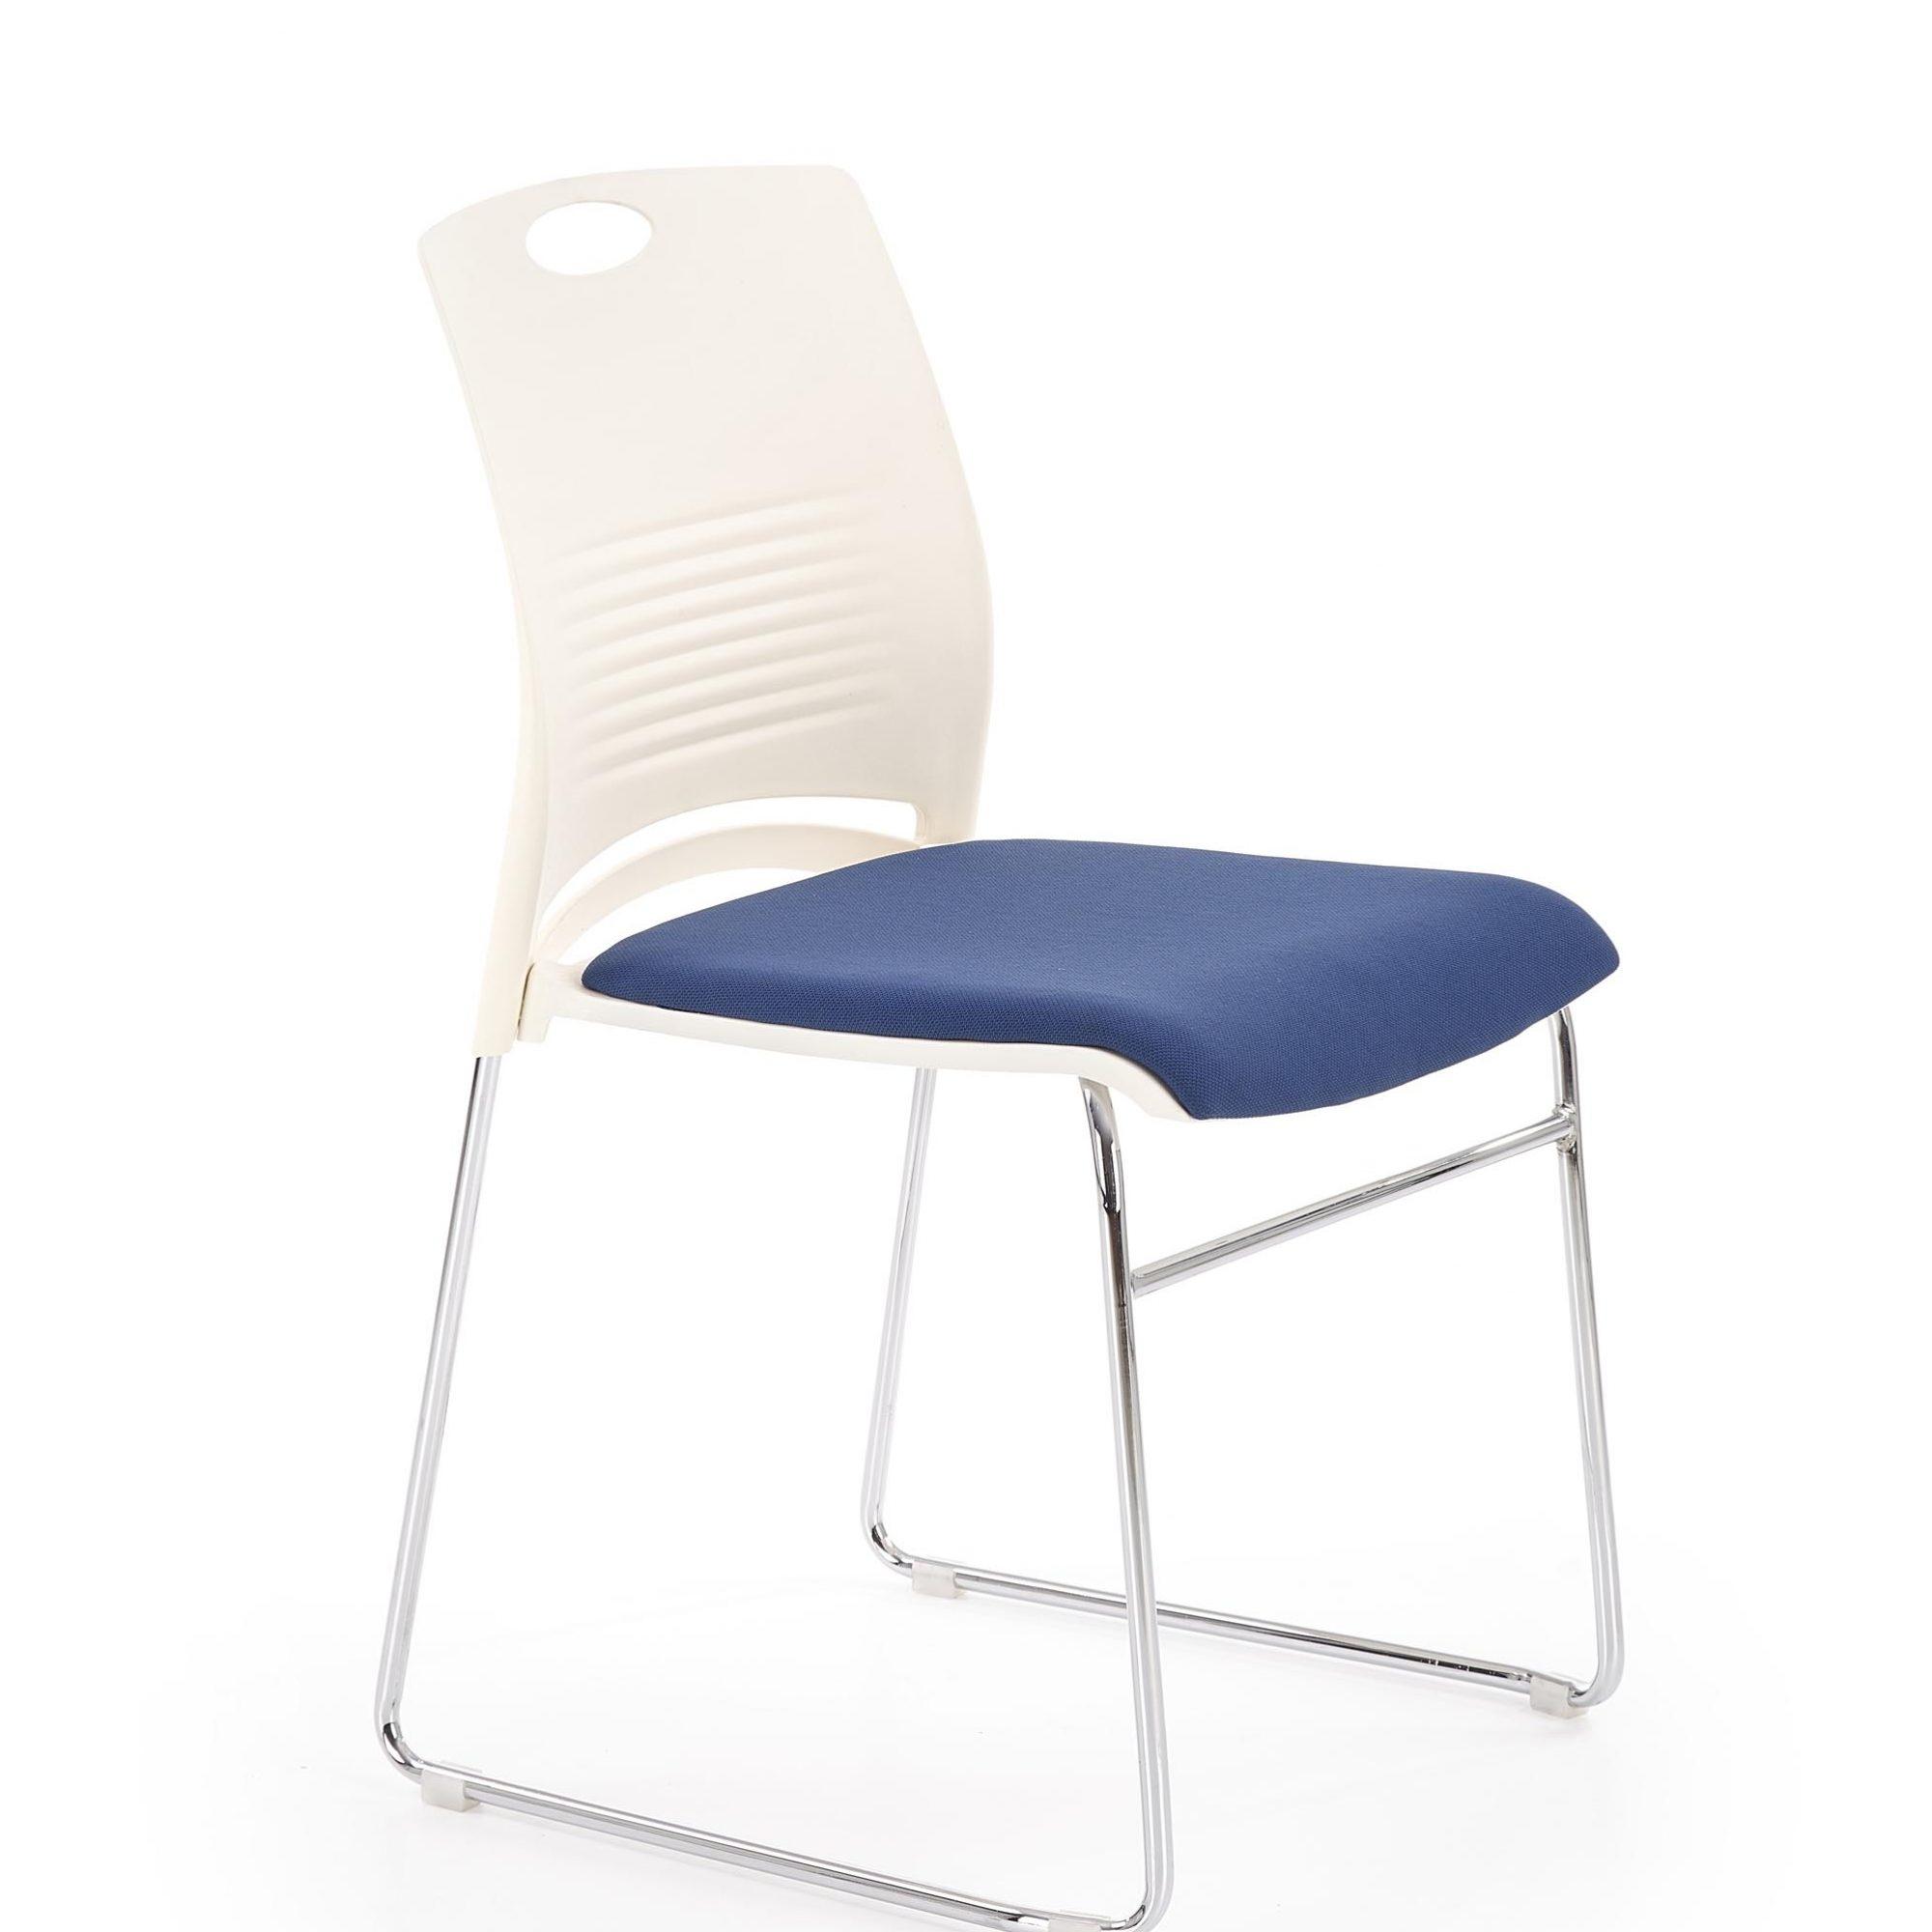 Scaun din plastic, cu sezut tapitat cu stofa si picioare metalice Calis Alb / Albastru, l44xA52xH80 cm